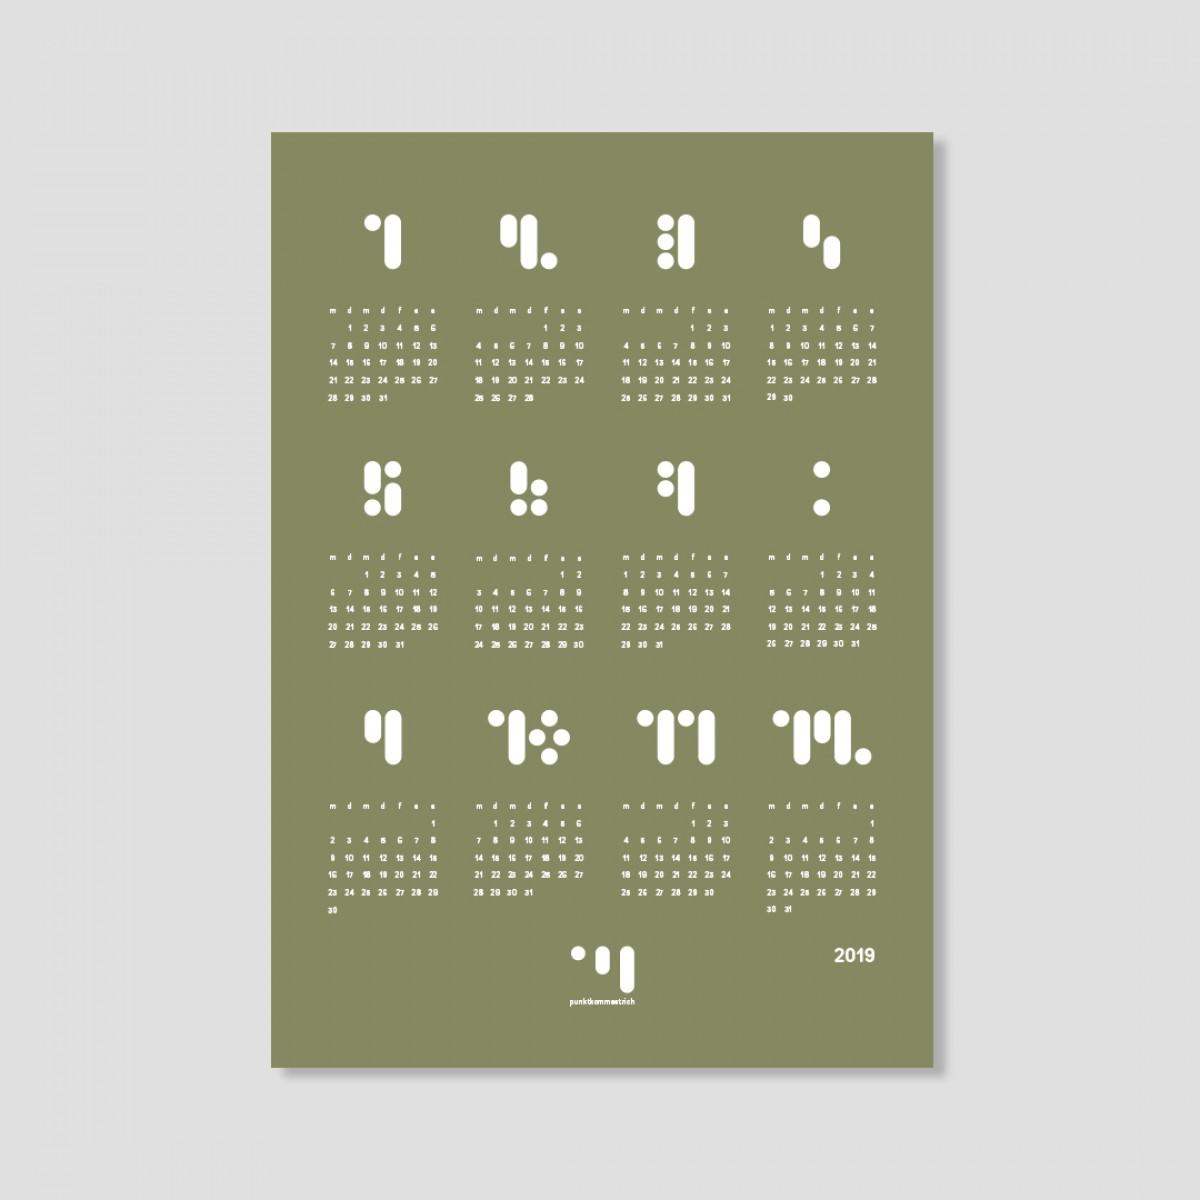 kalender 2019 moss stone Designwandkalender